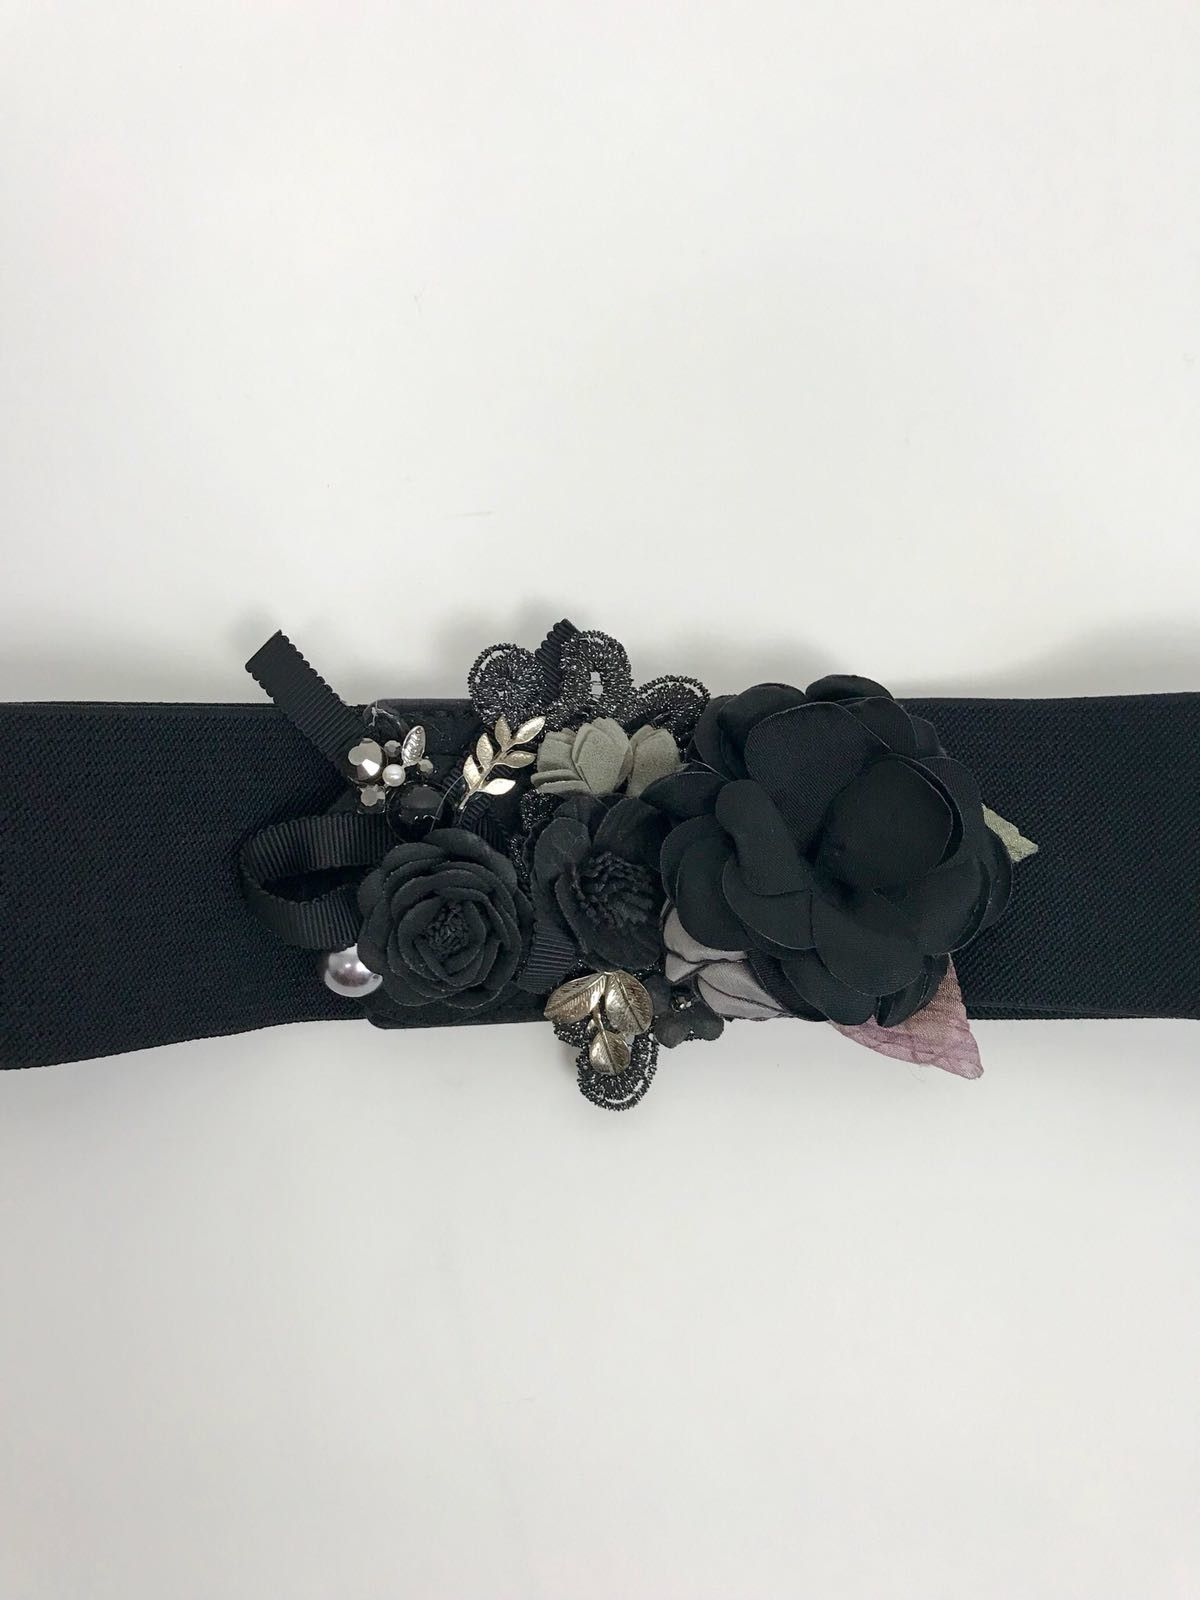 Applied Flowers Stretch Belt Cod.7161